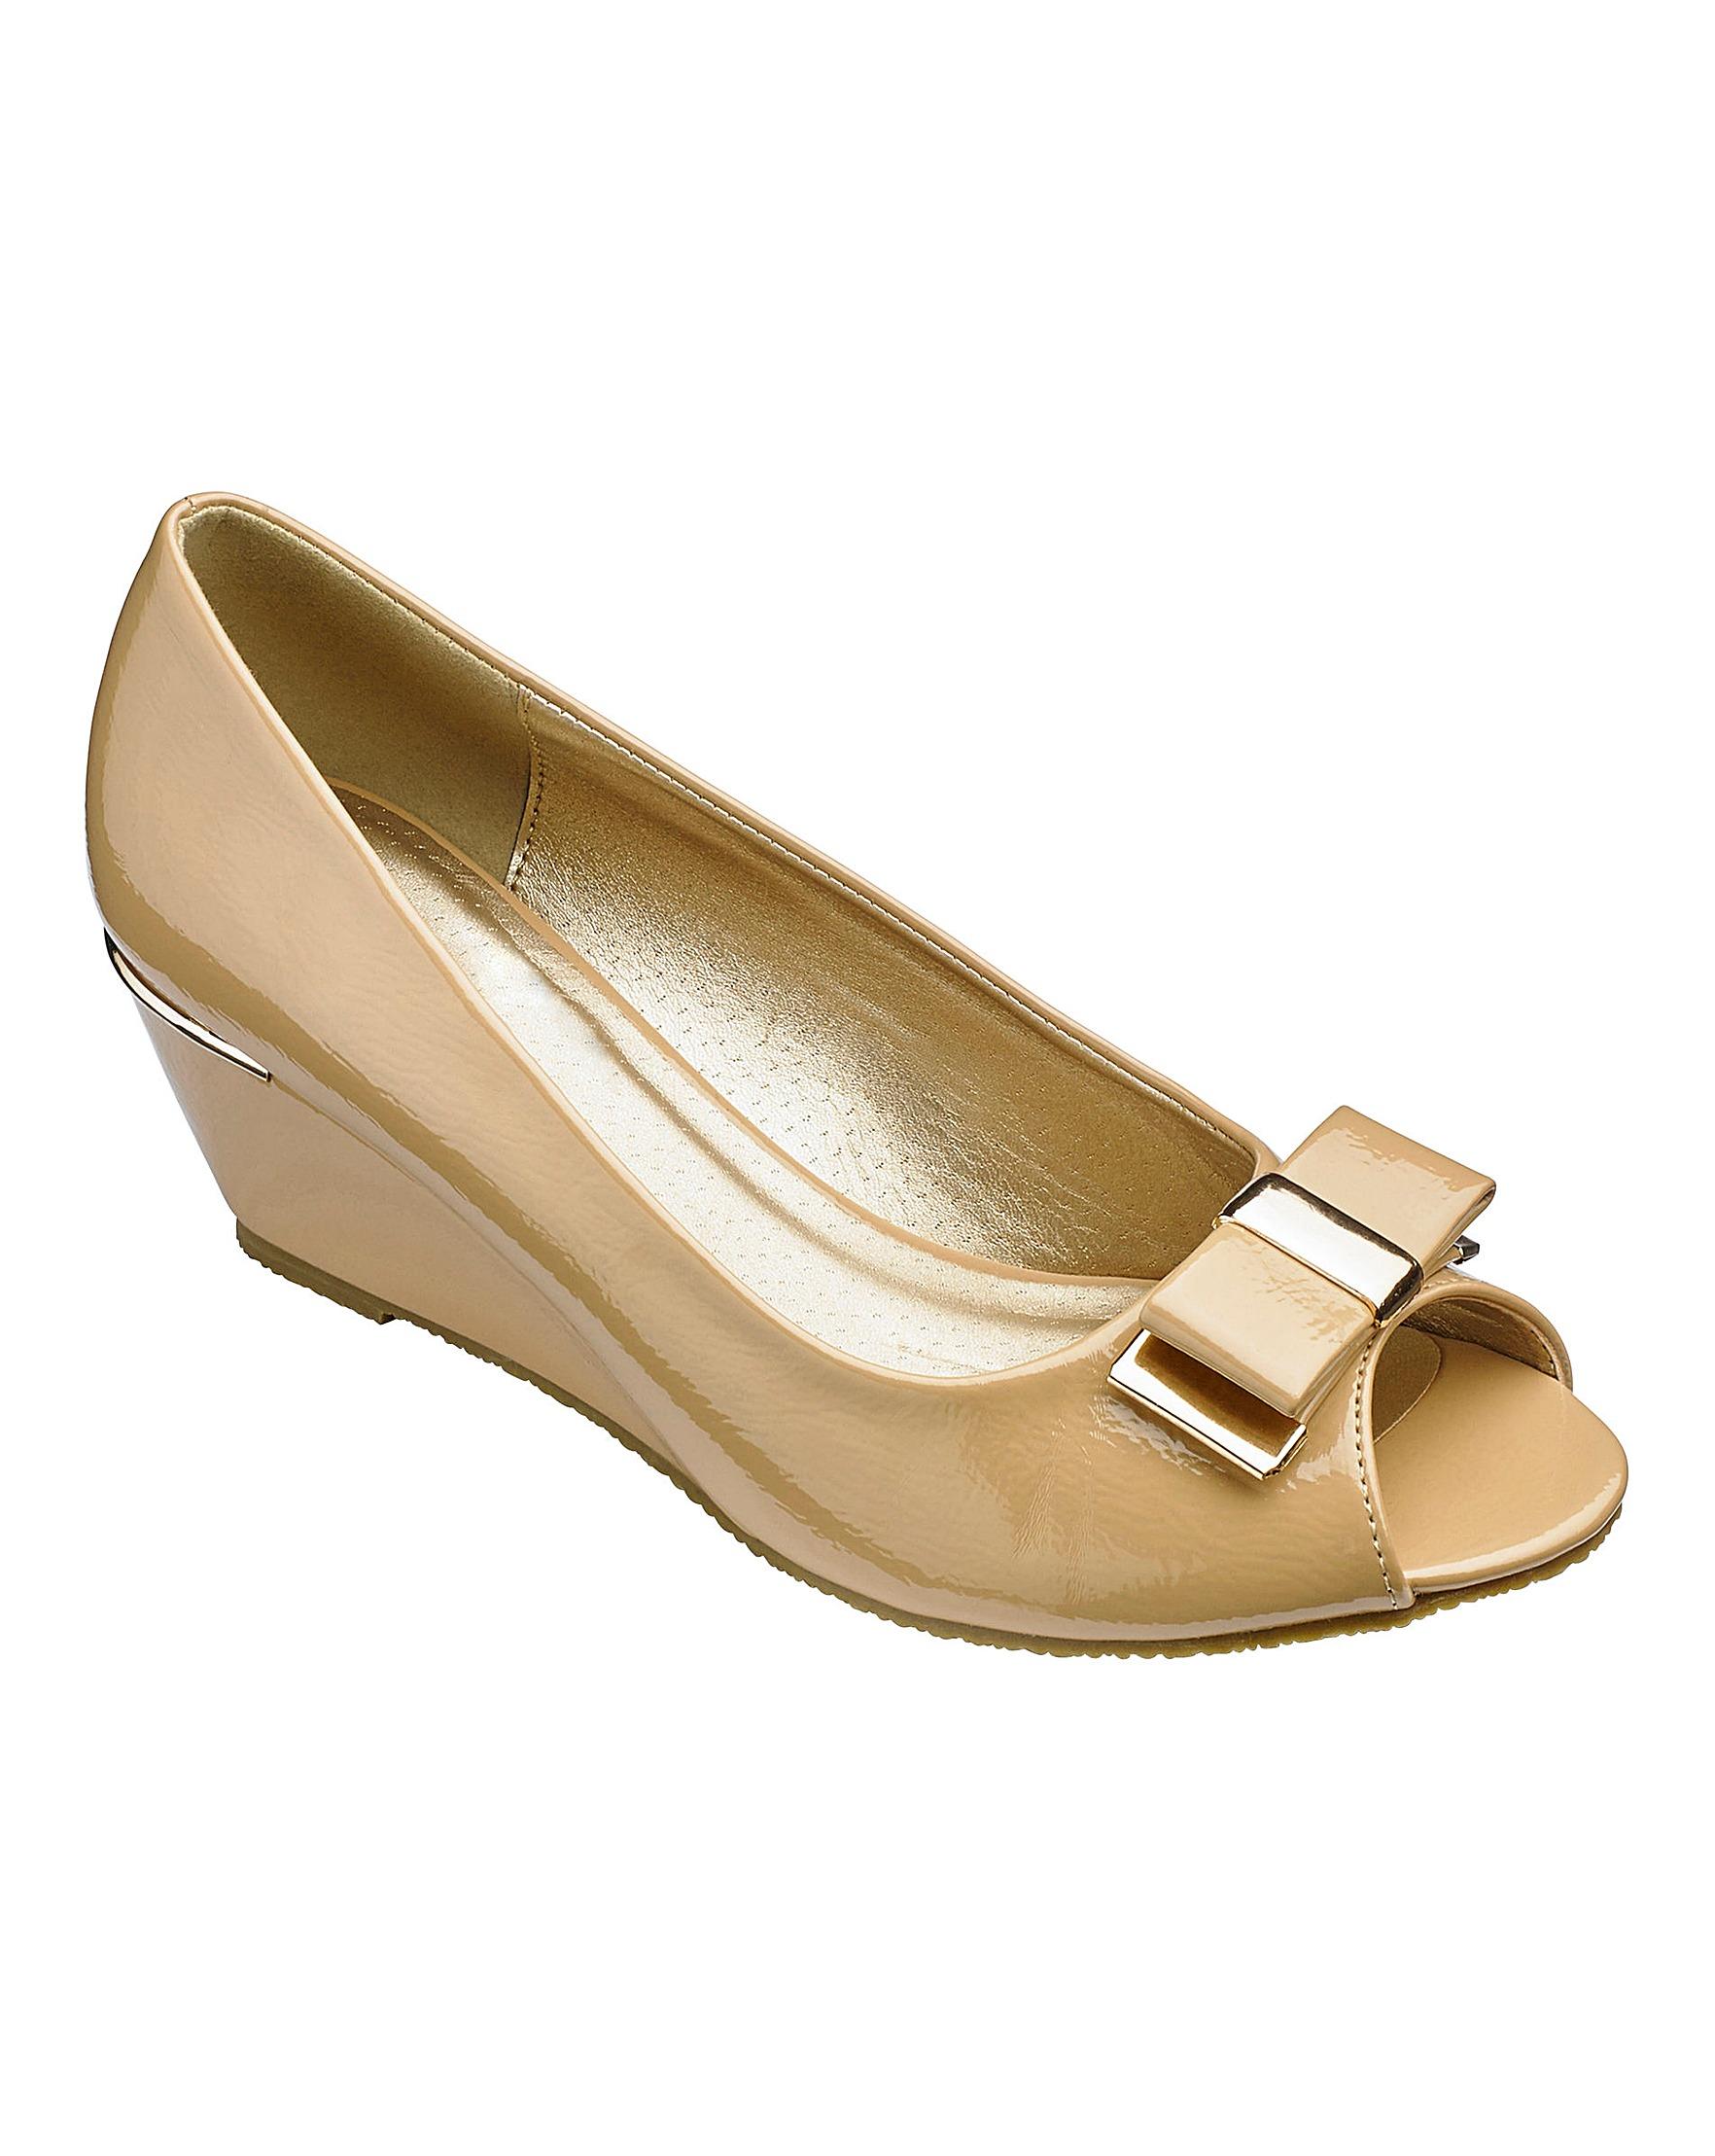 ee220940233 Footflex by Lotus Peep Toe Wedge Shoes Wide E Fit